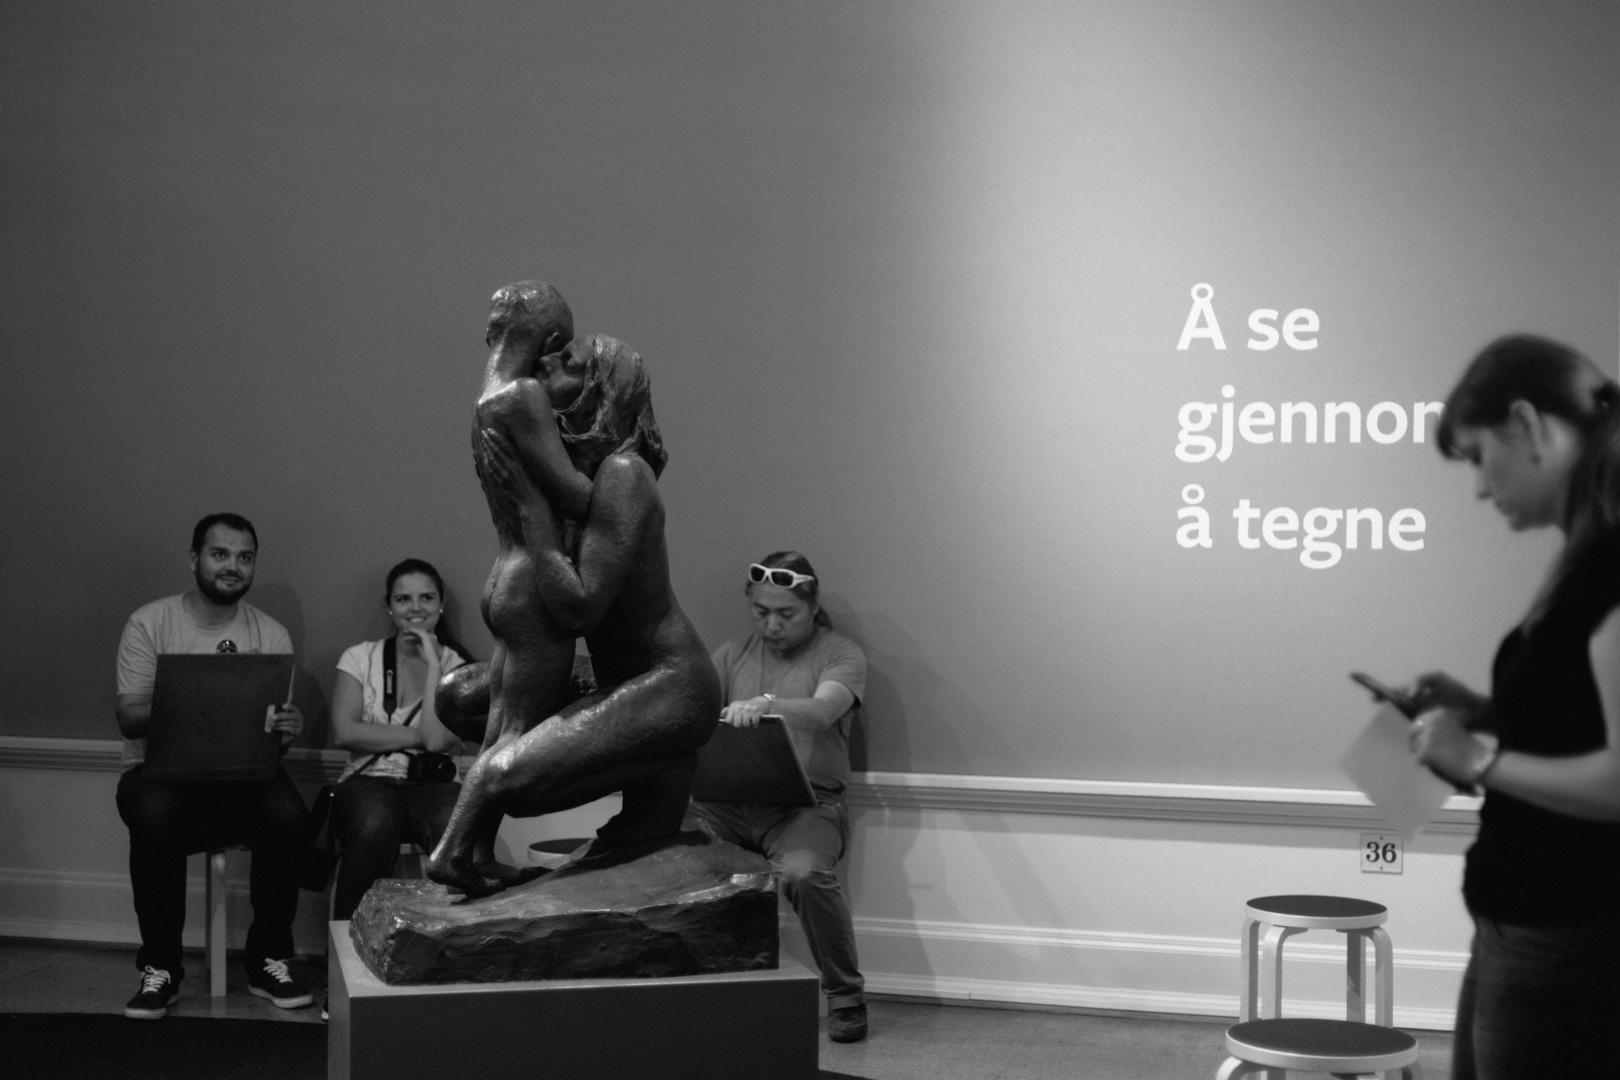 Le-Sycomore_Travel_Oslo_NationalMuseum_1.jpg